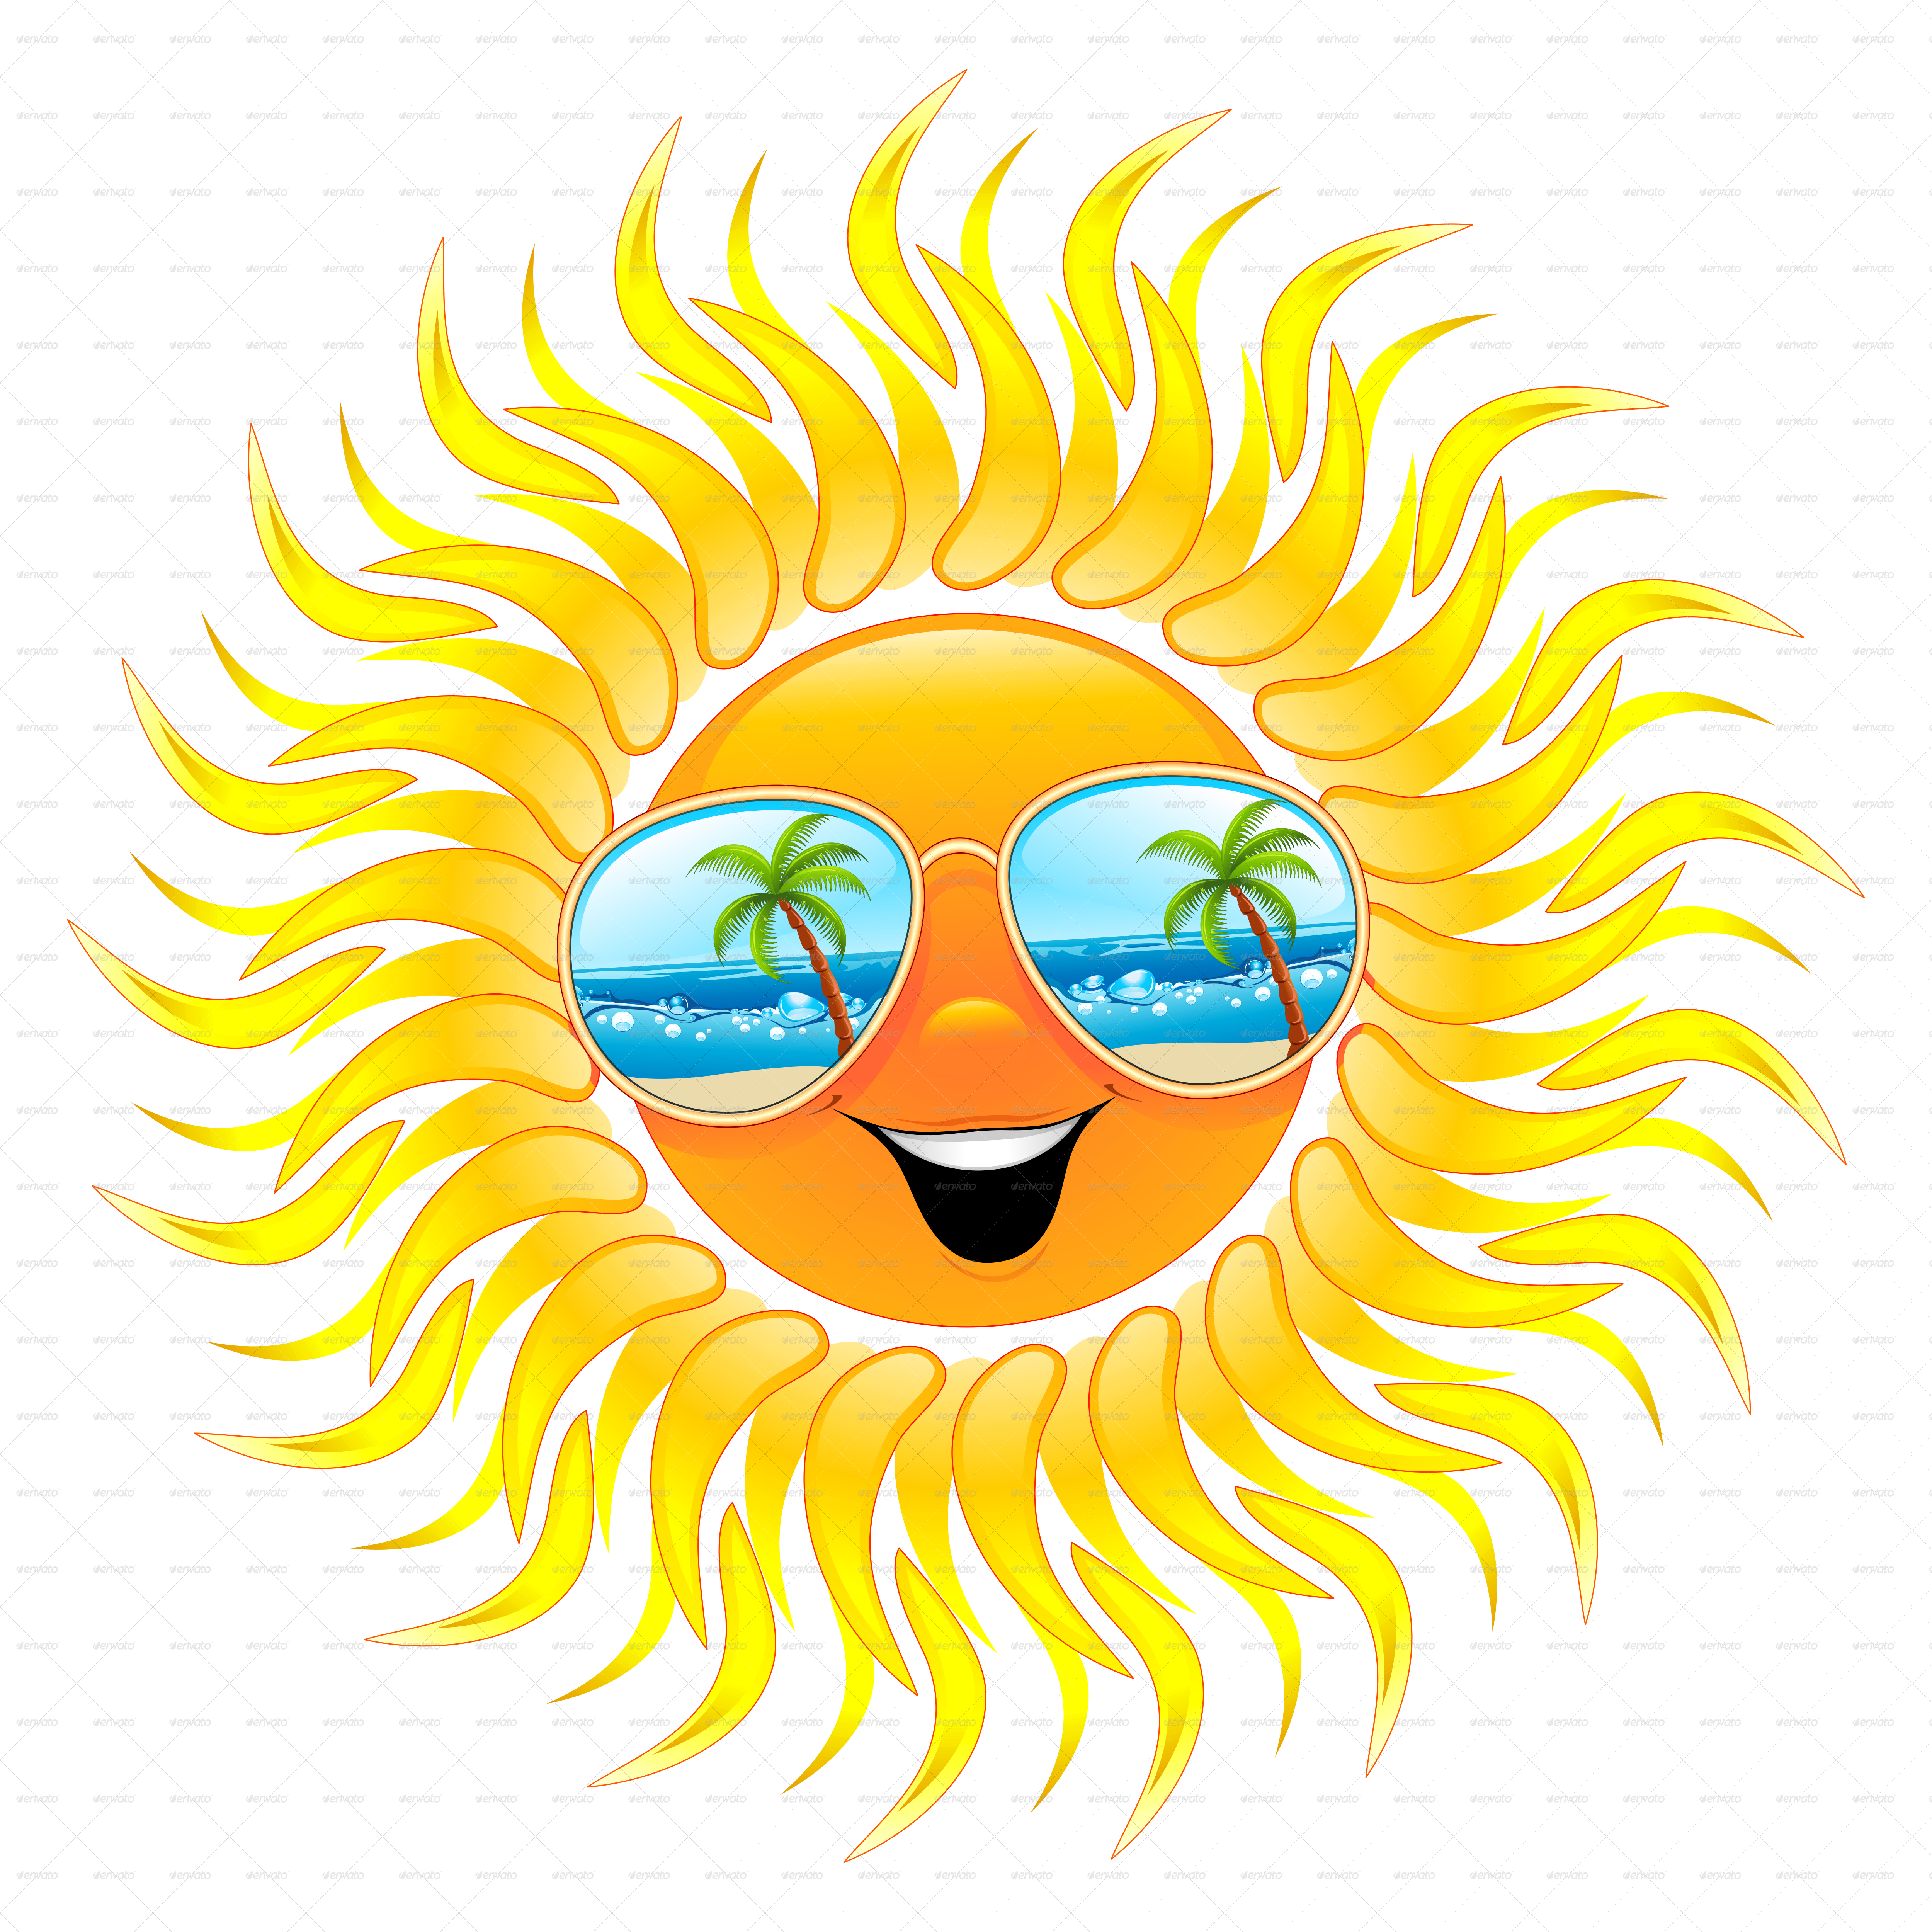 summer sun cartoon with sunglasses by bluedarkat